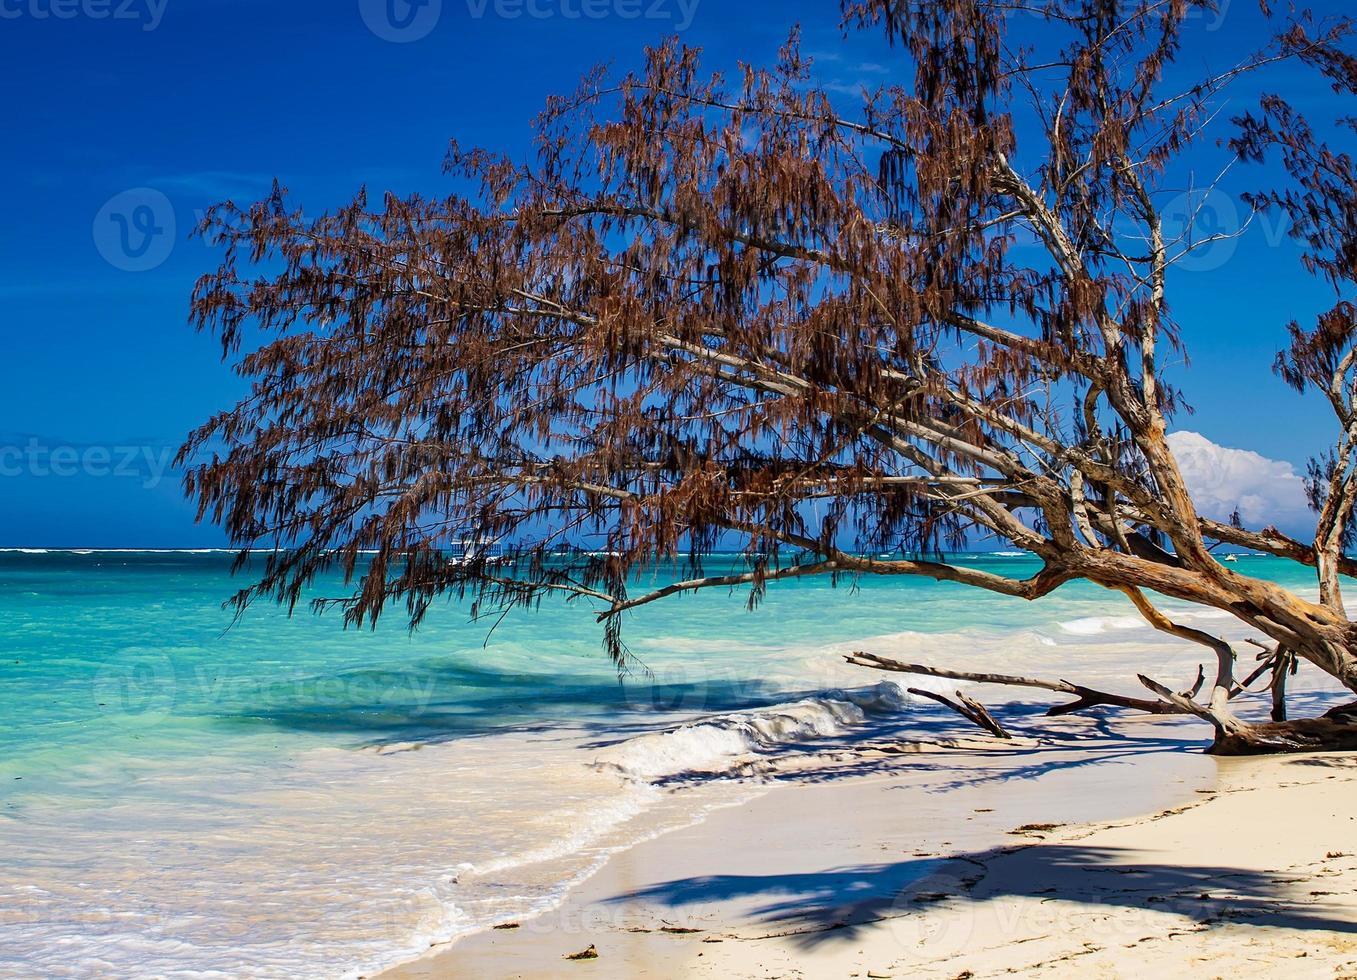 playa tropical en el mar caribe foto